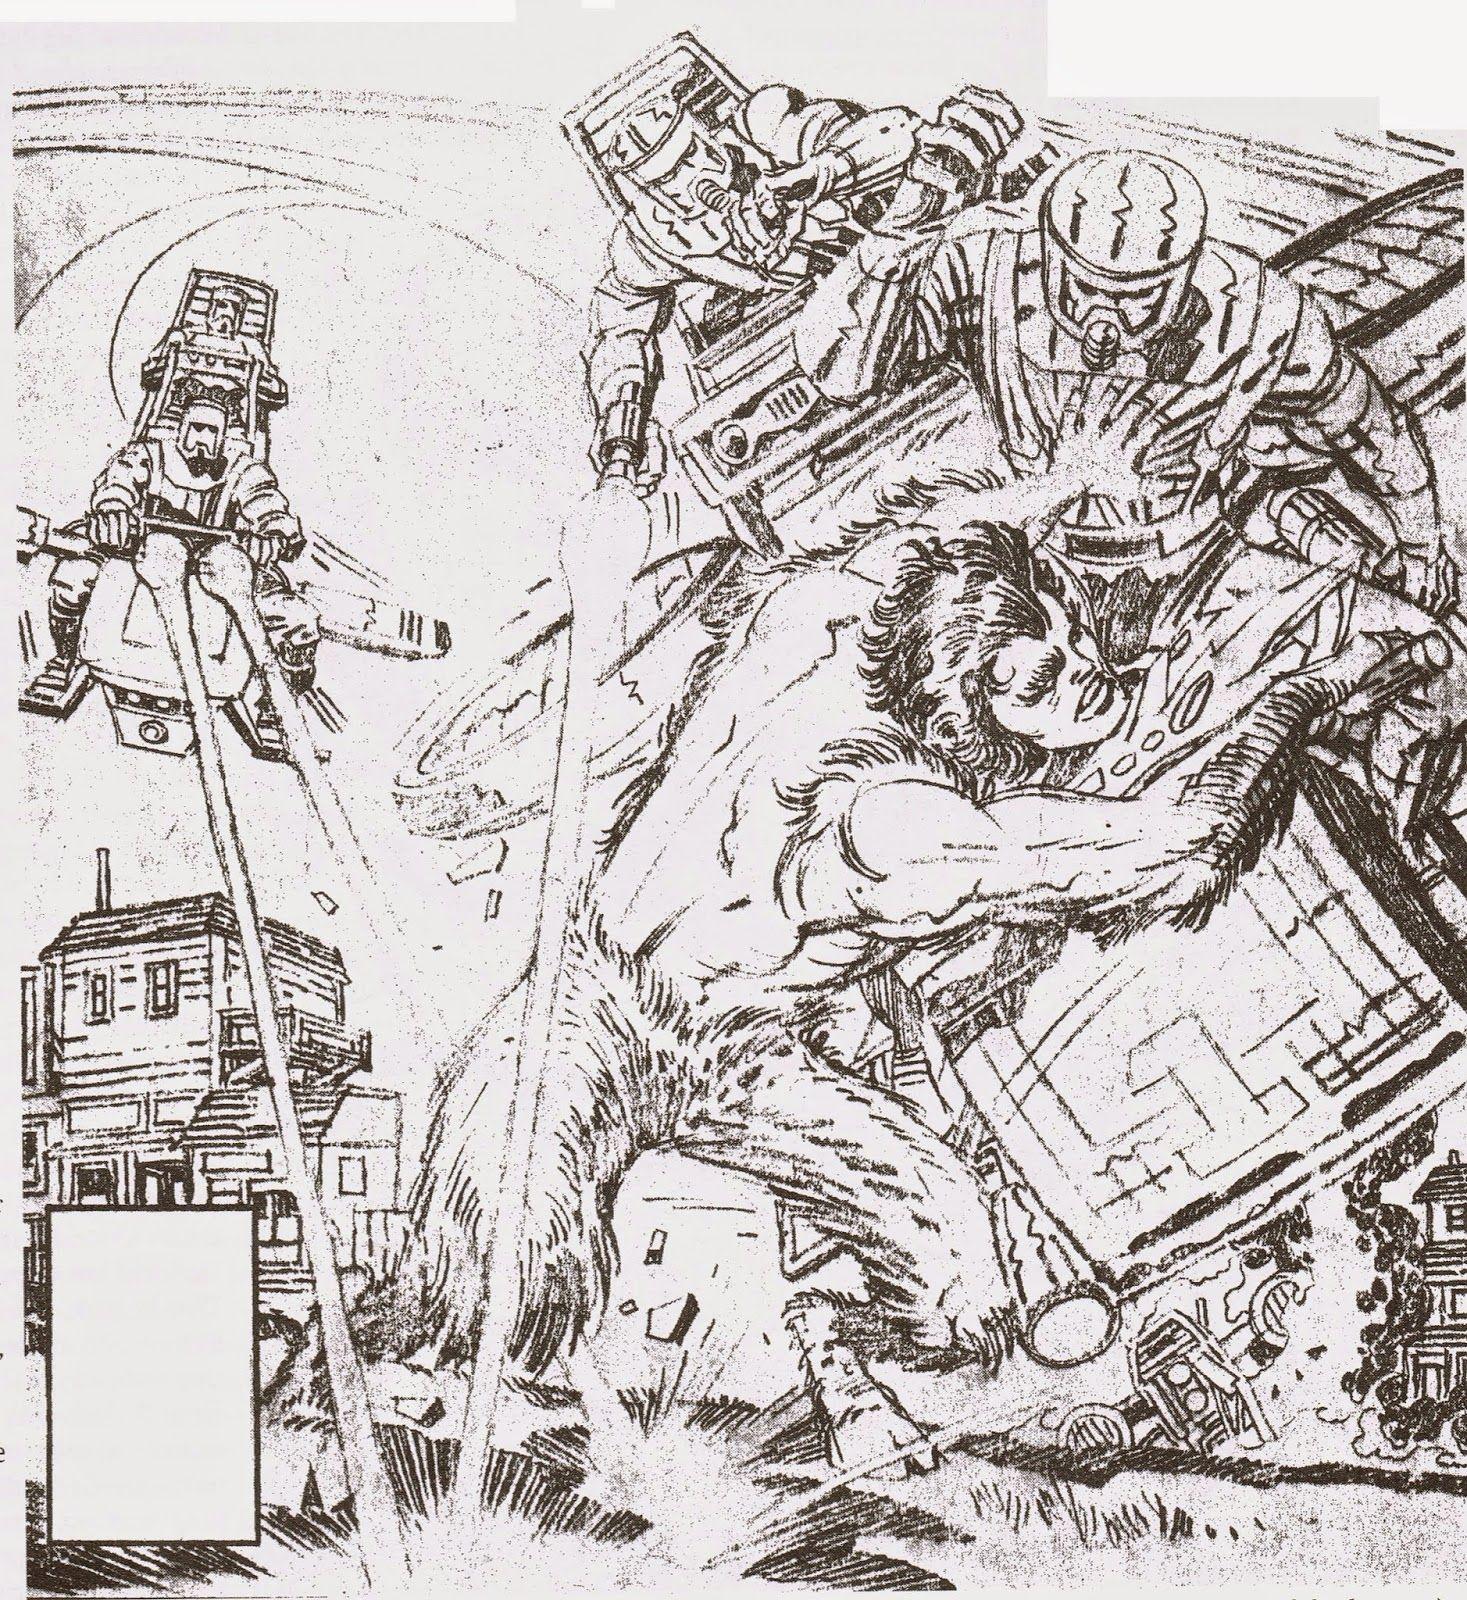 Cap'n's Comics: Woodgod by Jack Kirby